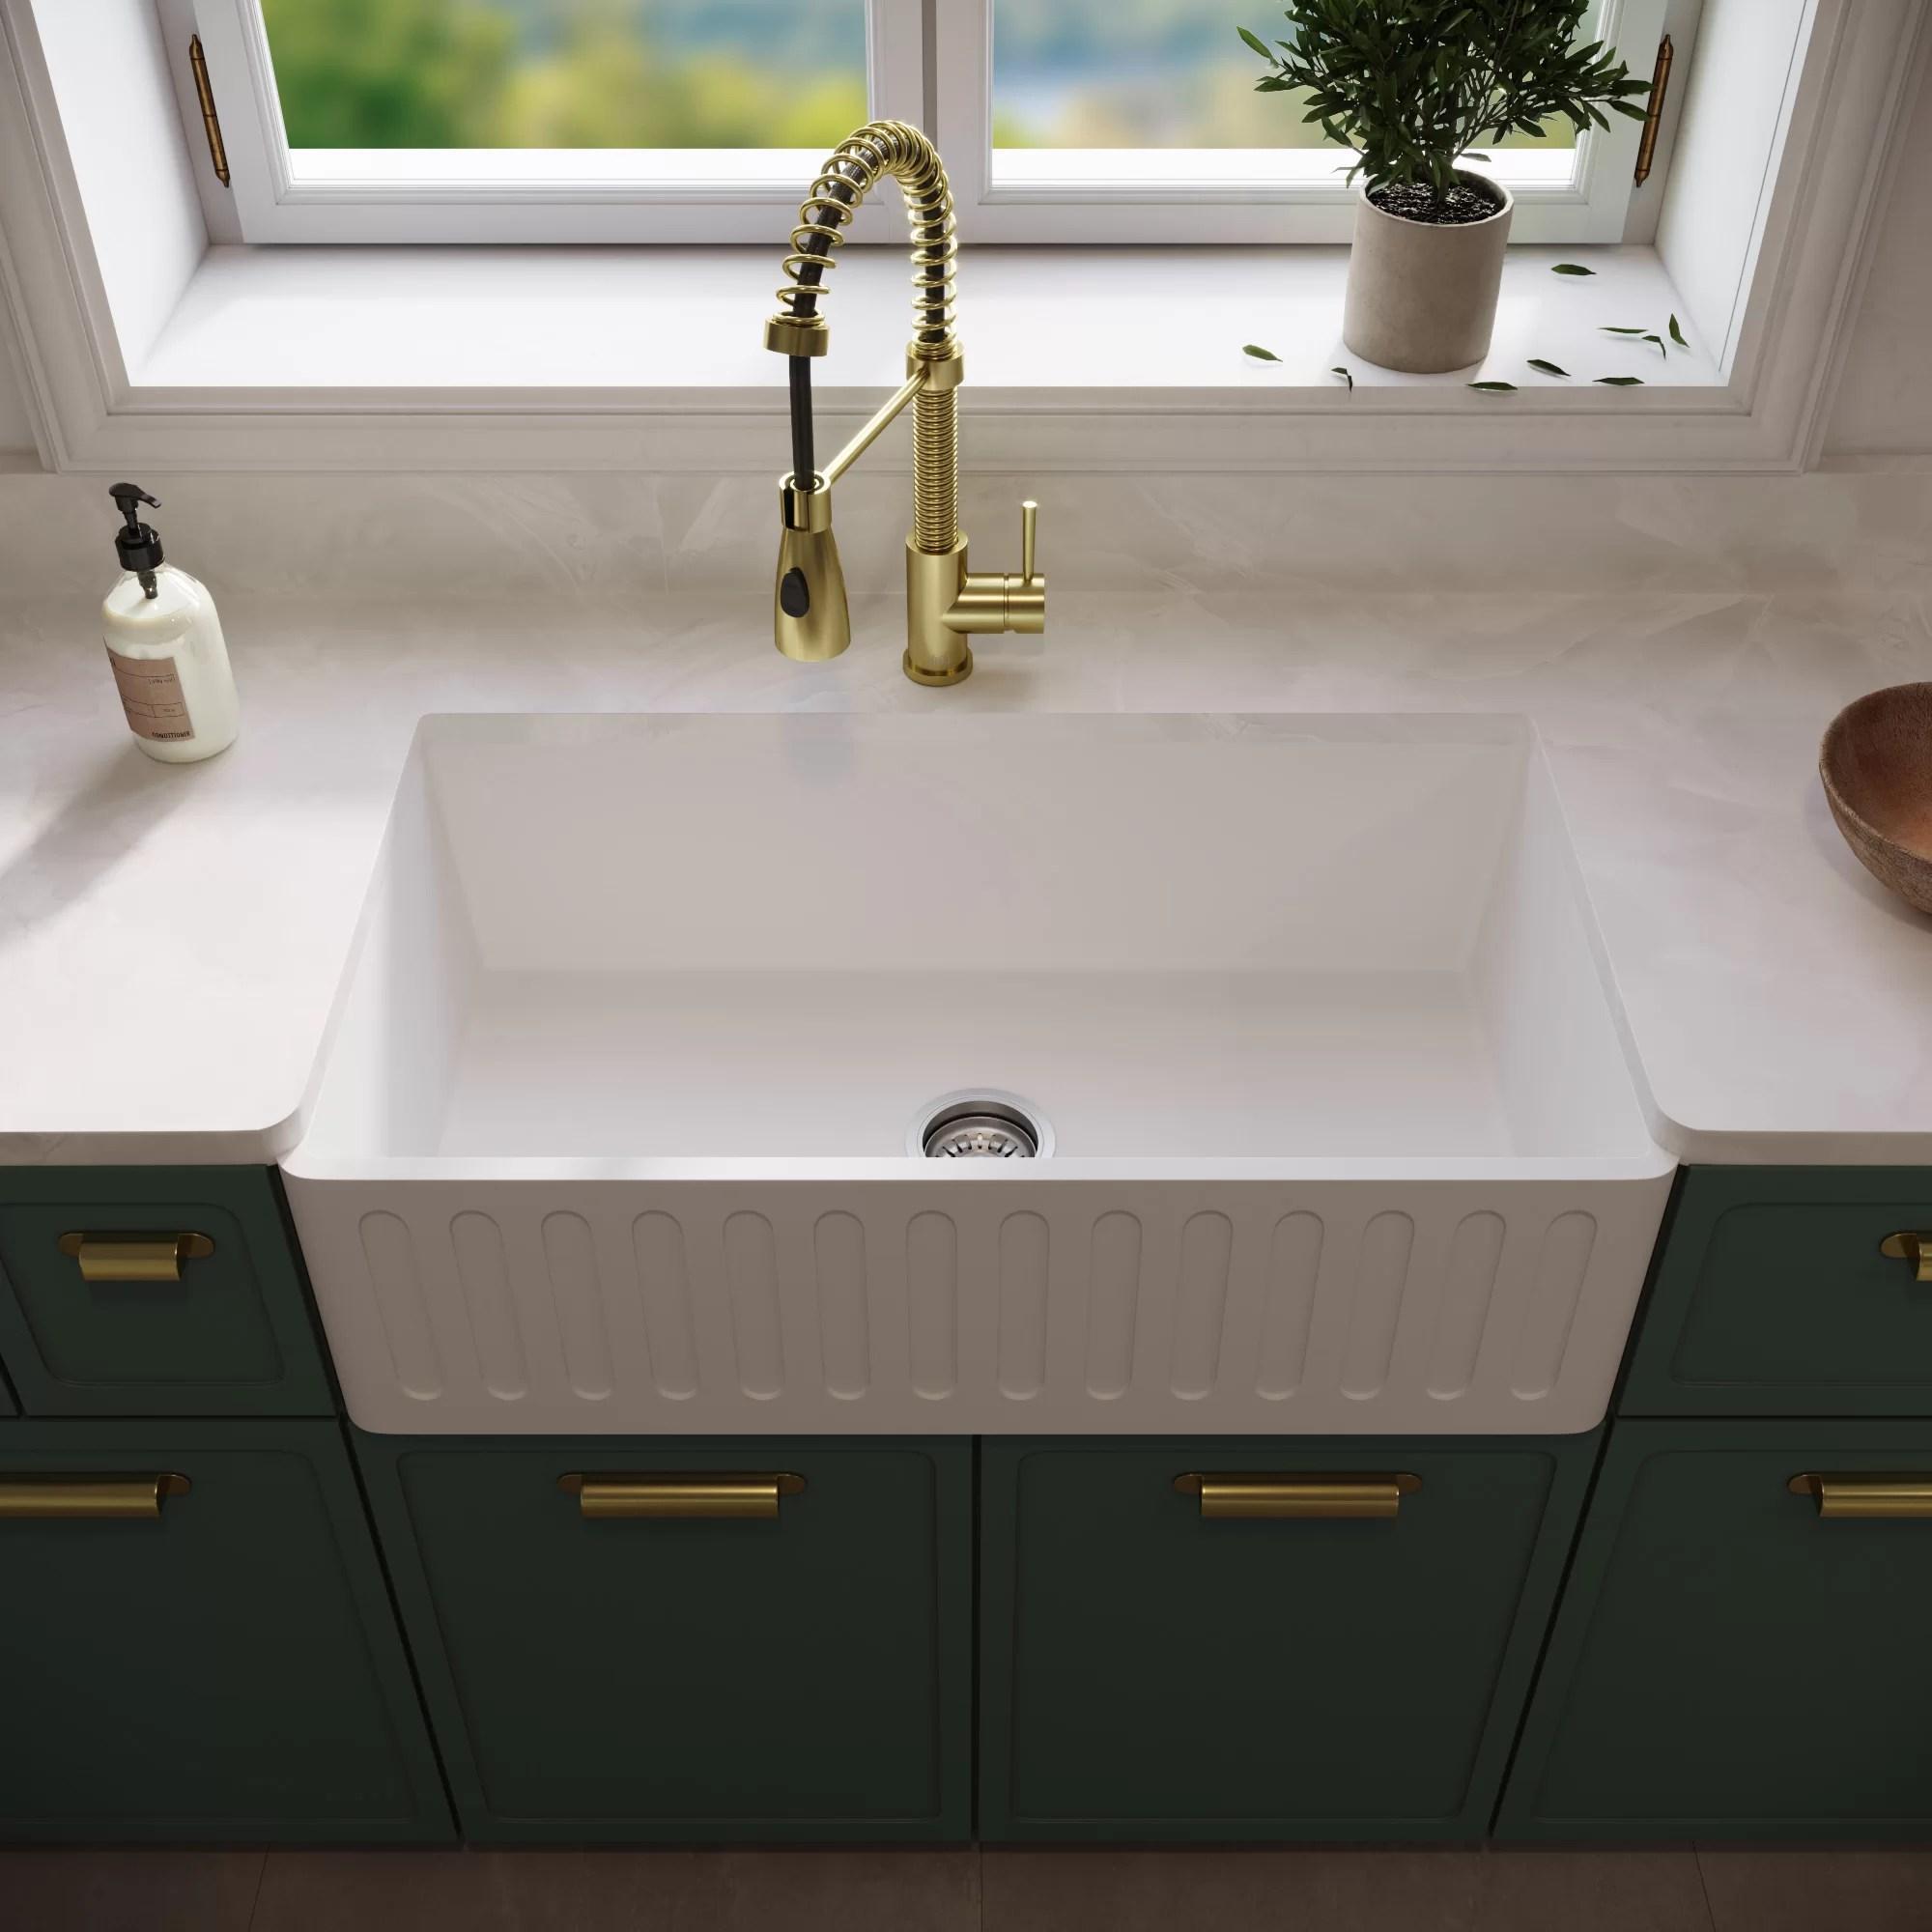 Vigo Matte Stone 33 L X 18 W Farmhouse Apron Kitchen Sink With Basket Strainer Reviews Wayfair